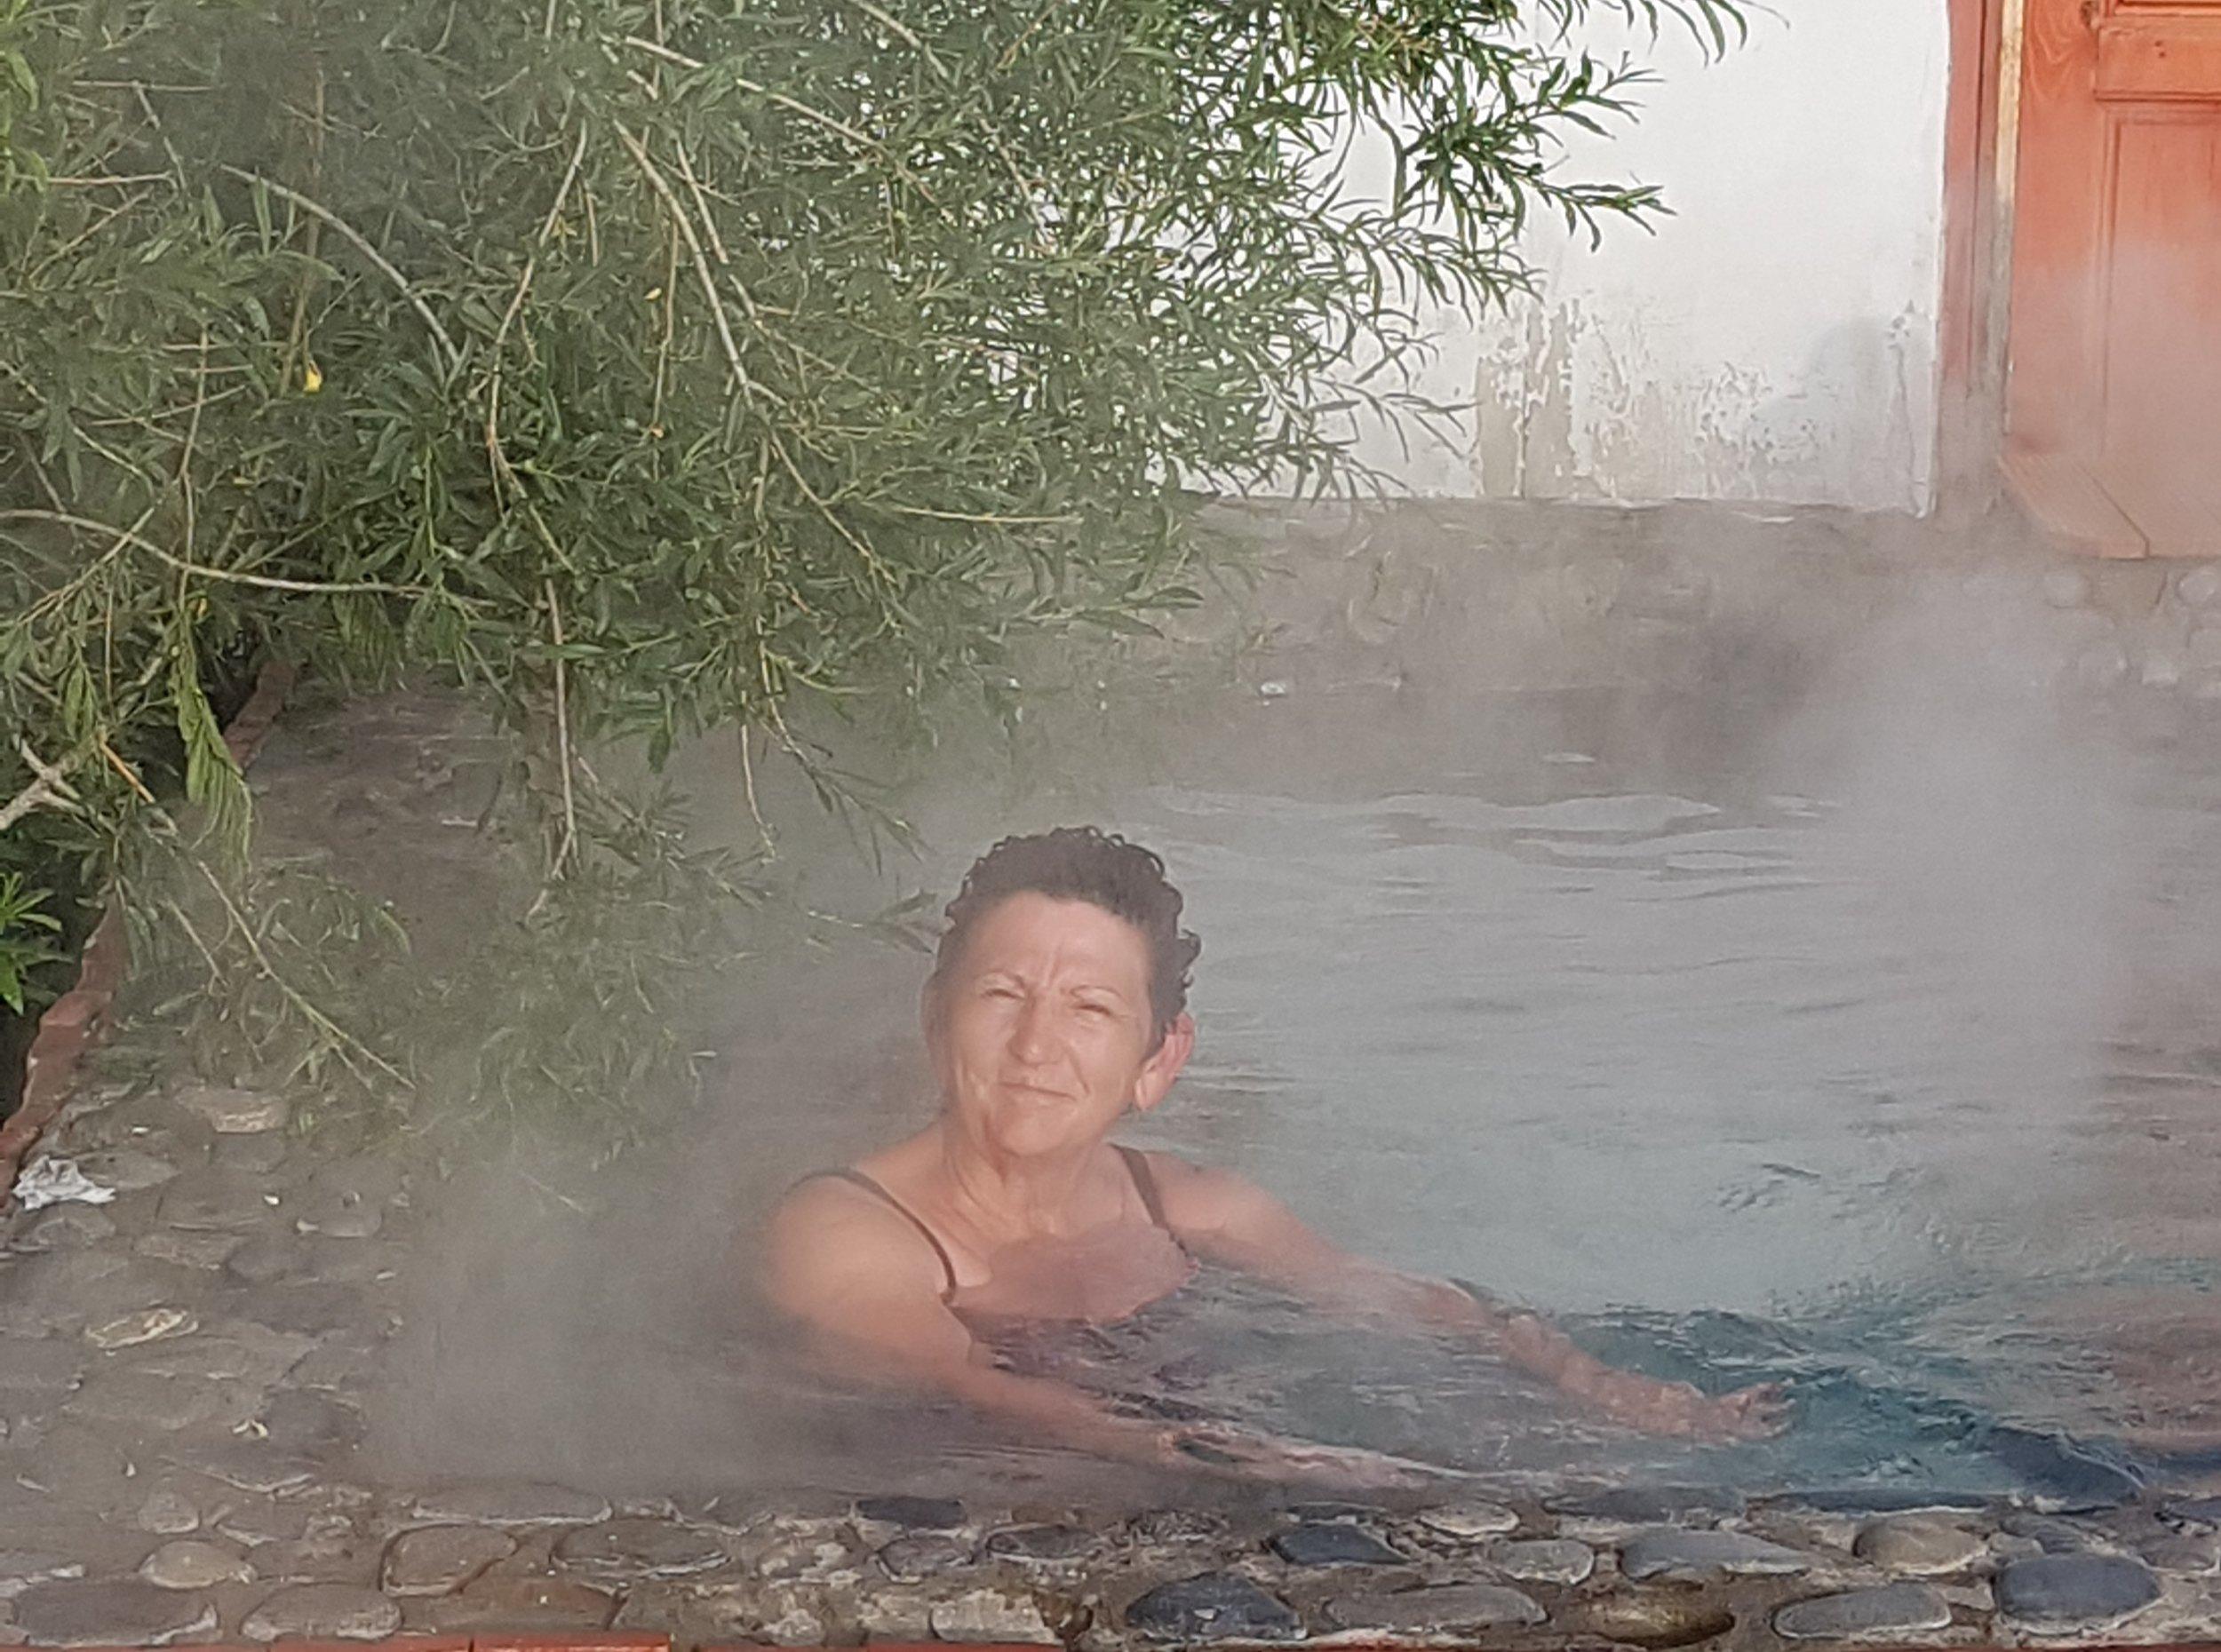 Enjoying hotsprings